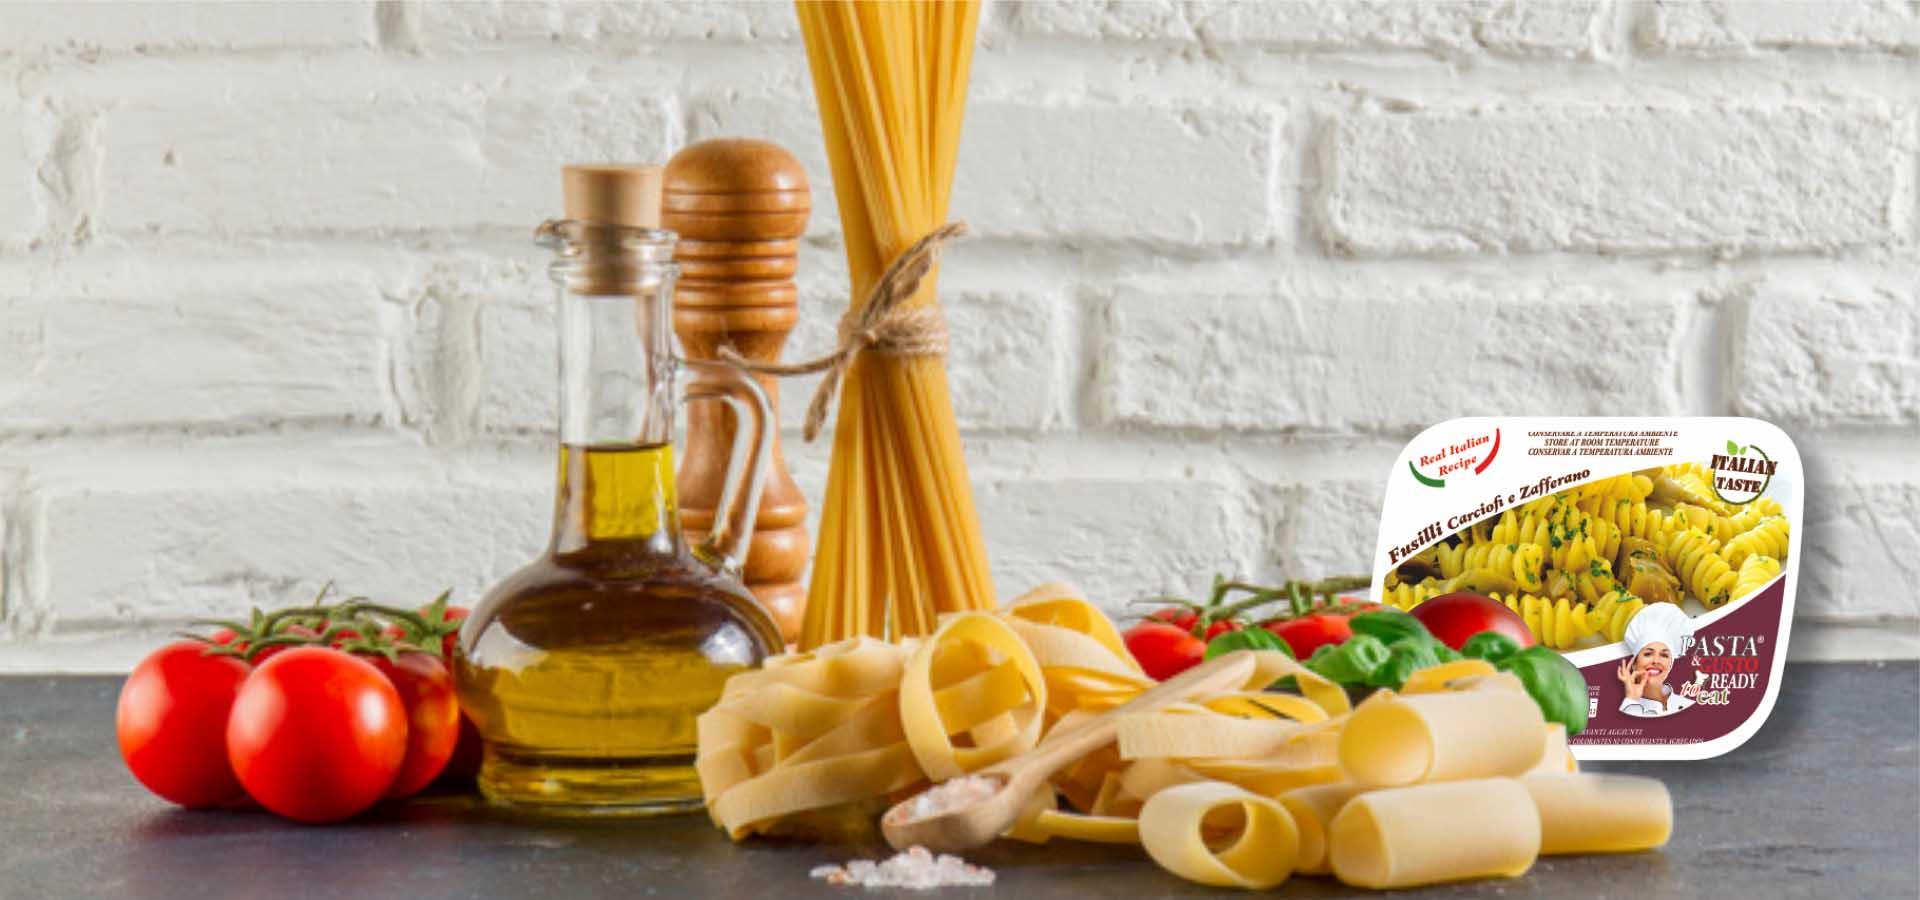 Pasta Ready To Eat Slider Fusilli Carciofi Zafferano Ready Meals